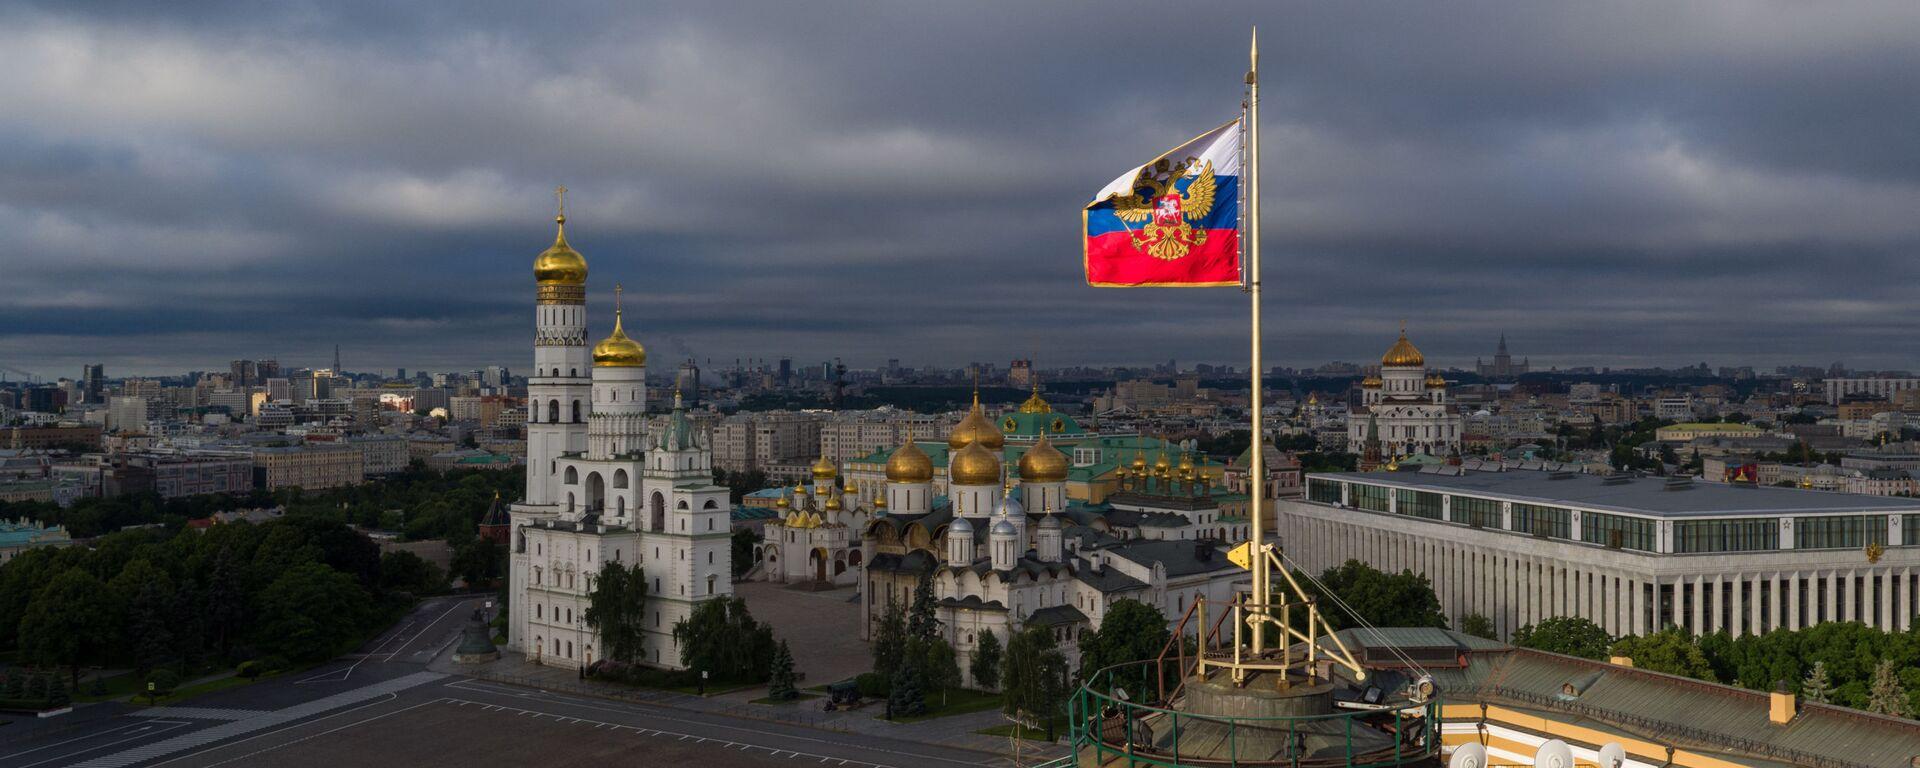 Kreml - Sputnik Polska, 1920, 24.08.2021